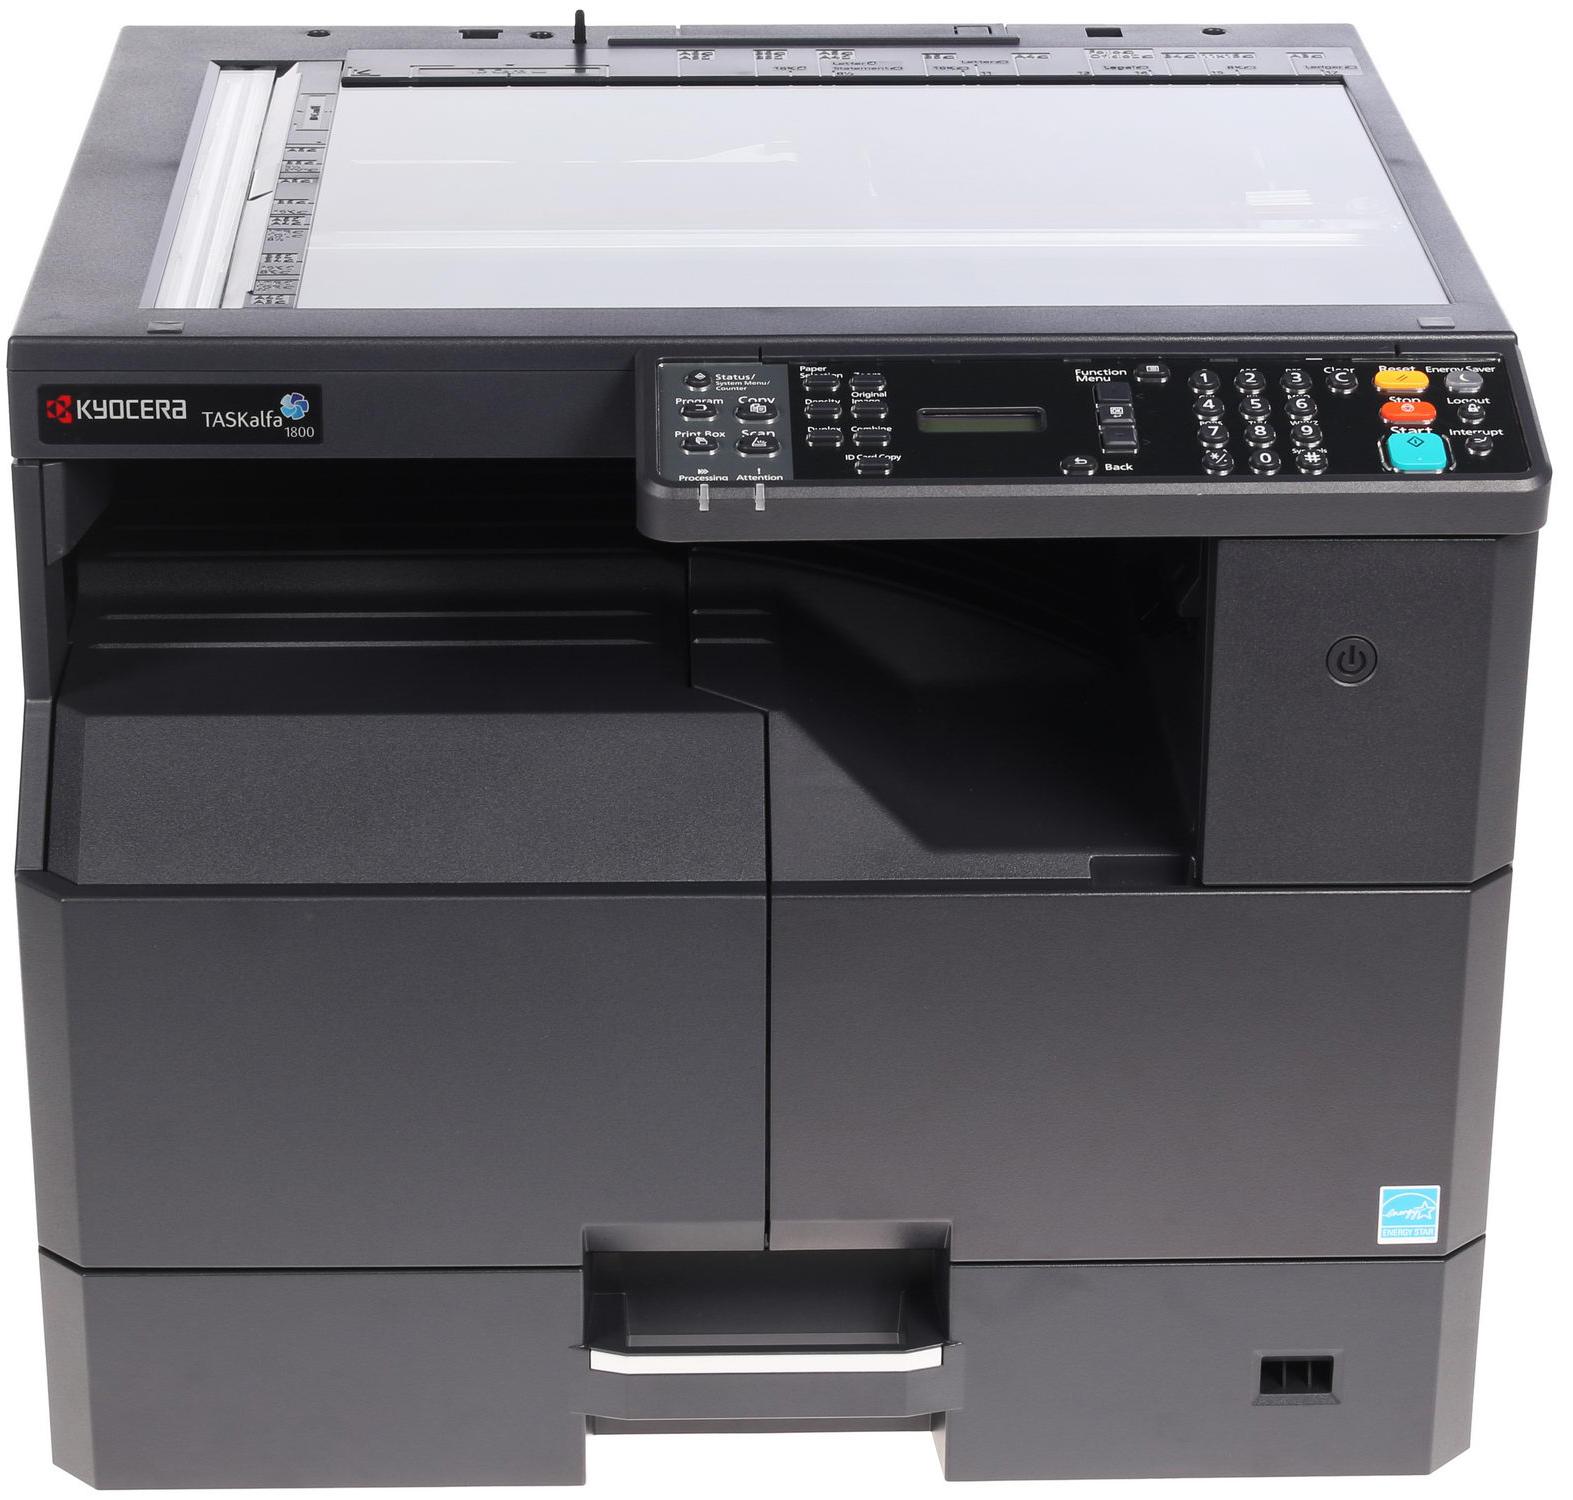 Ремонт принтера Kyocera TASKalfa 1800